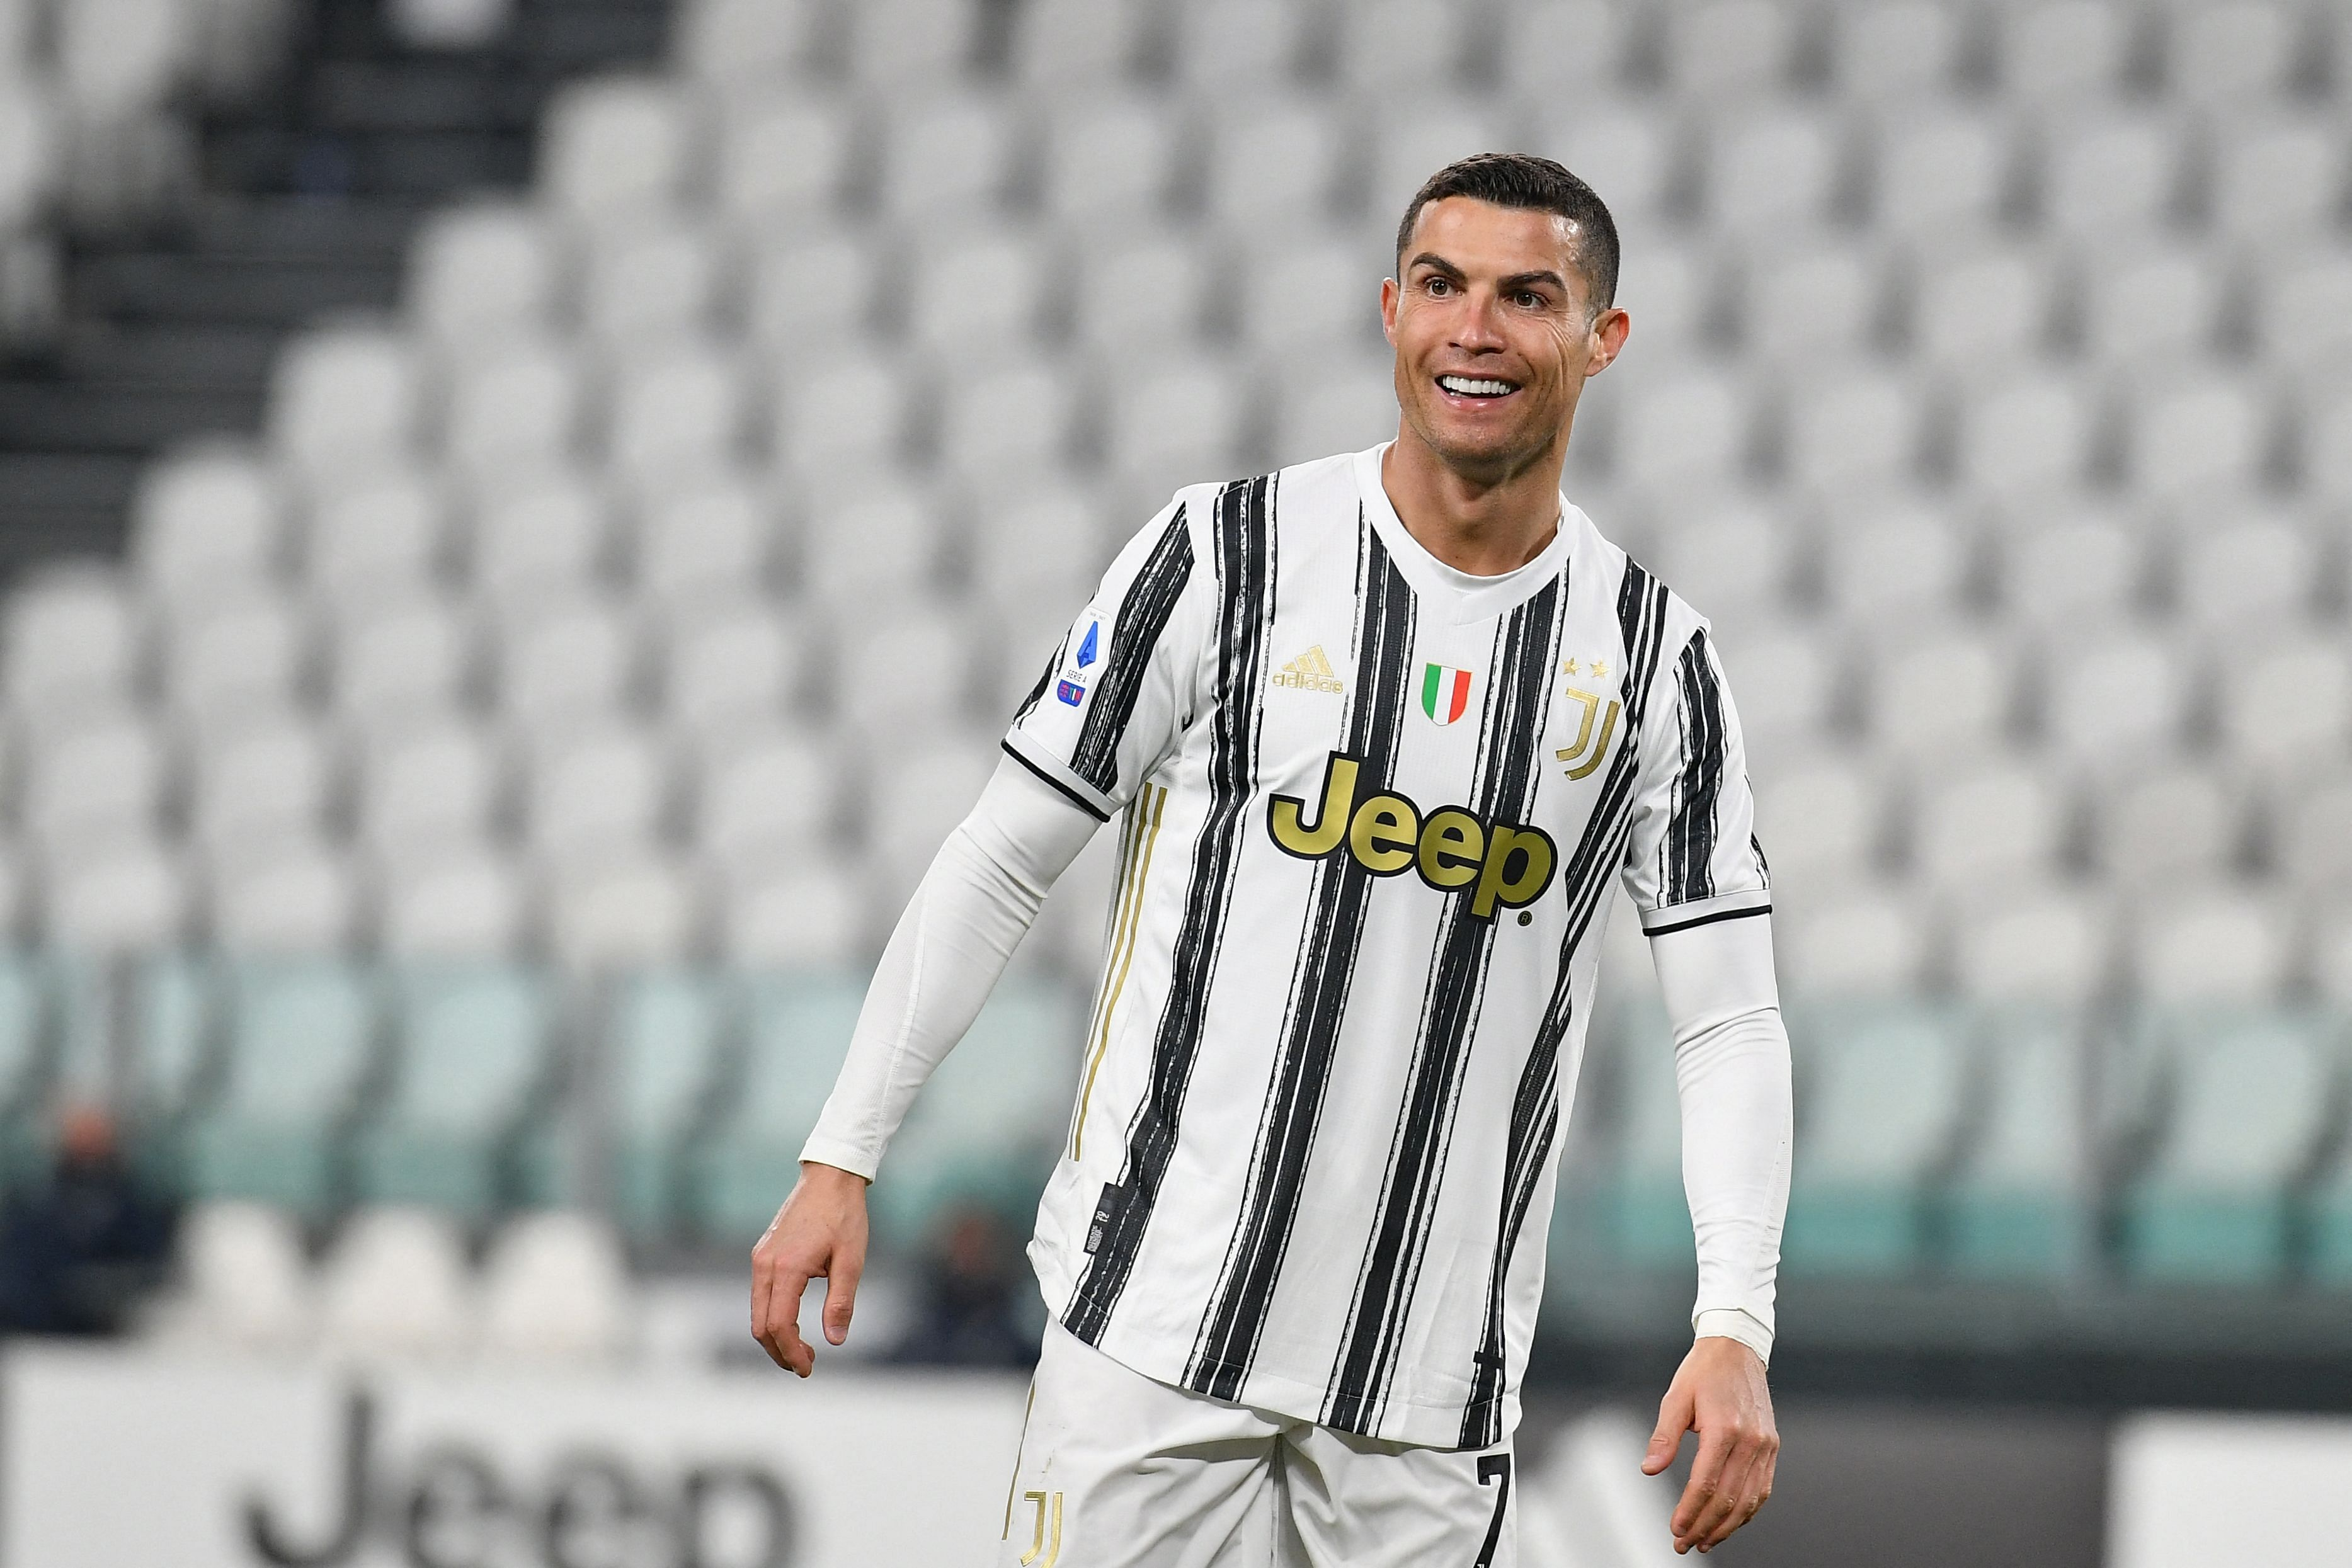 Football: Ronaldo marks 600th league game with landmark goal as Juventus  beat Spezia, Football News & Top Stories - The Straits Times